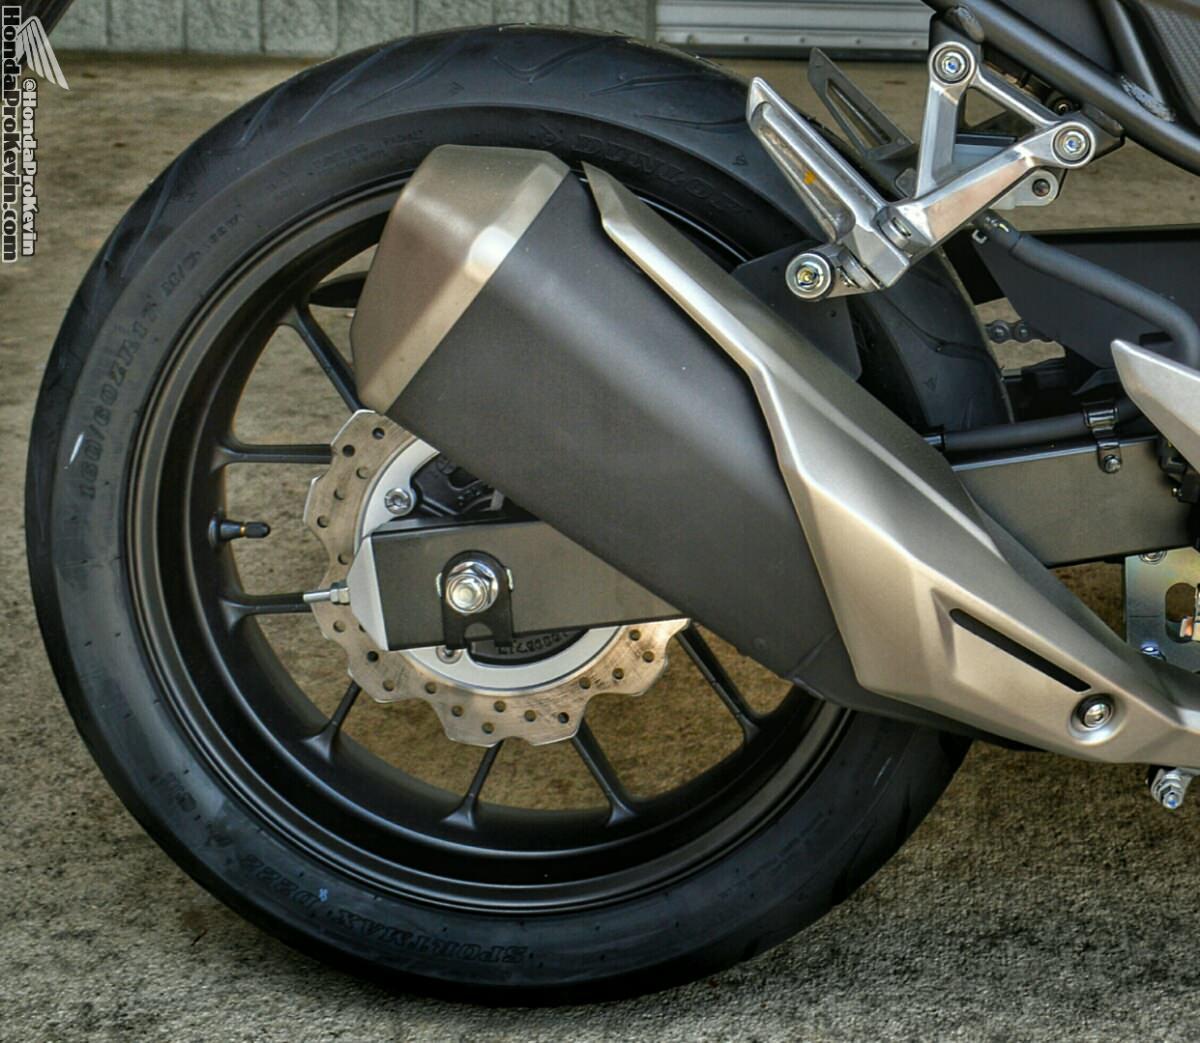 2017 Honda Cbr500r Review Of Specs Changes Cbr Sport Bike Foot Step L Belakang Cb Motorcycle Pro Kevin